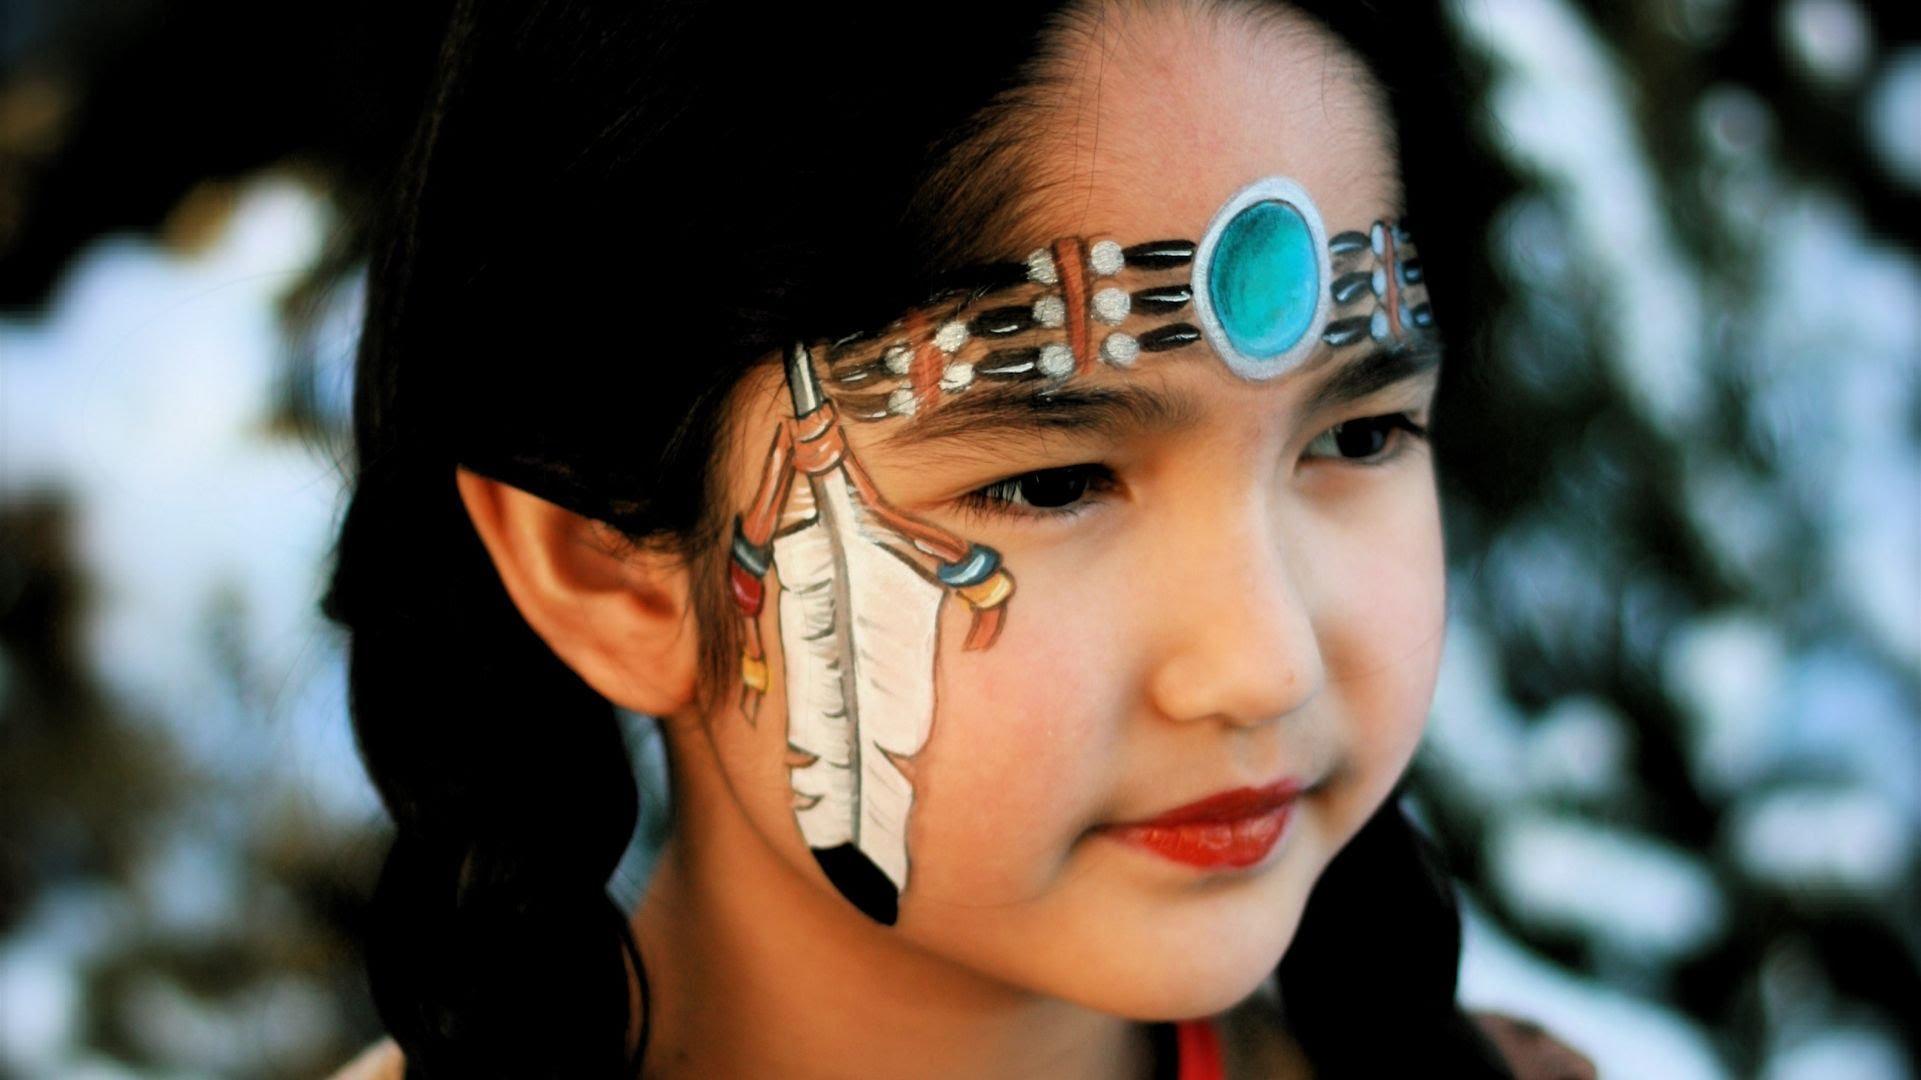 Trucco di Carnevale per bambini da indiana - VideoTrucco 8045c30eadb